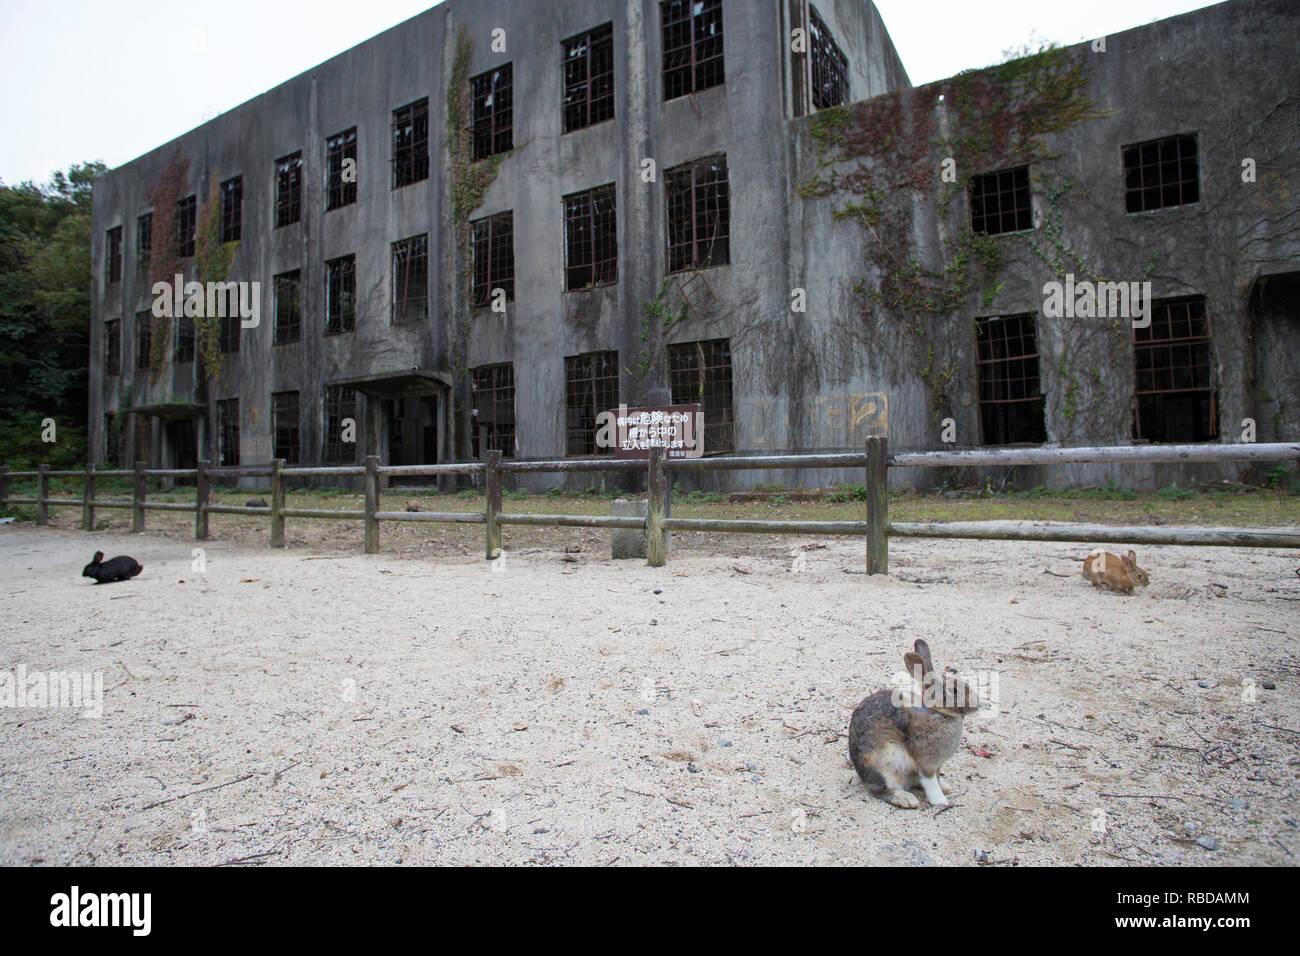 The ruins of the power plant in Okunojima island in Takehara, Hiroshima, Japan.  Photo by Akira Suemori - Stock Image